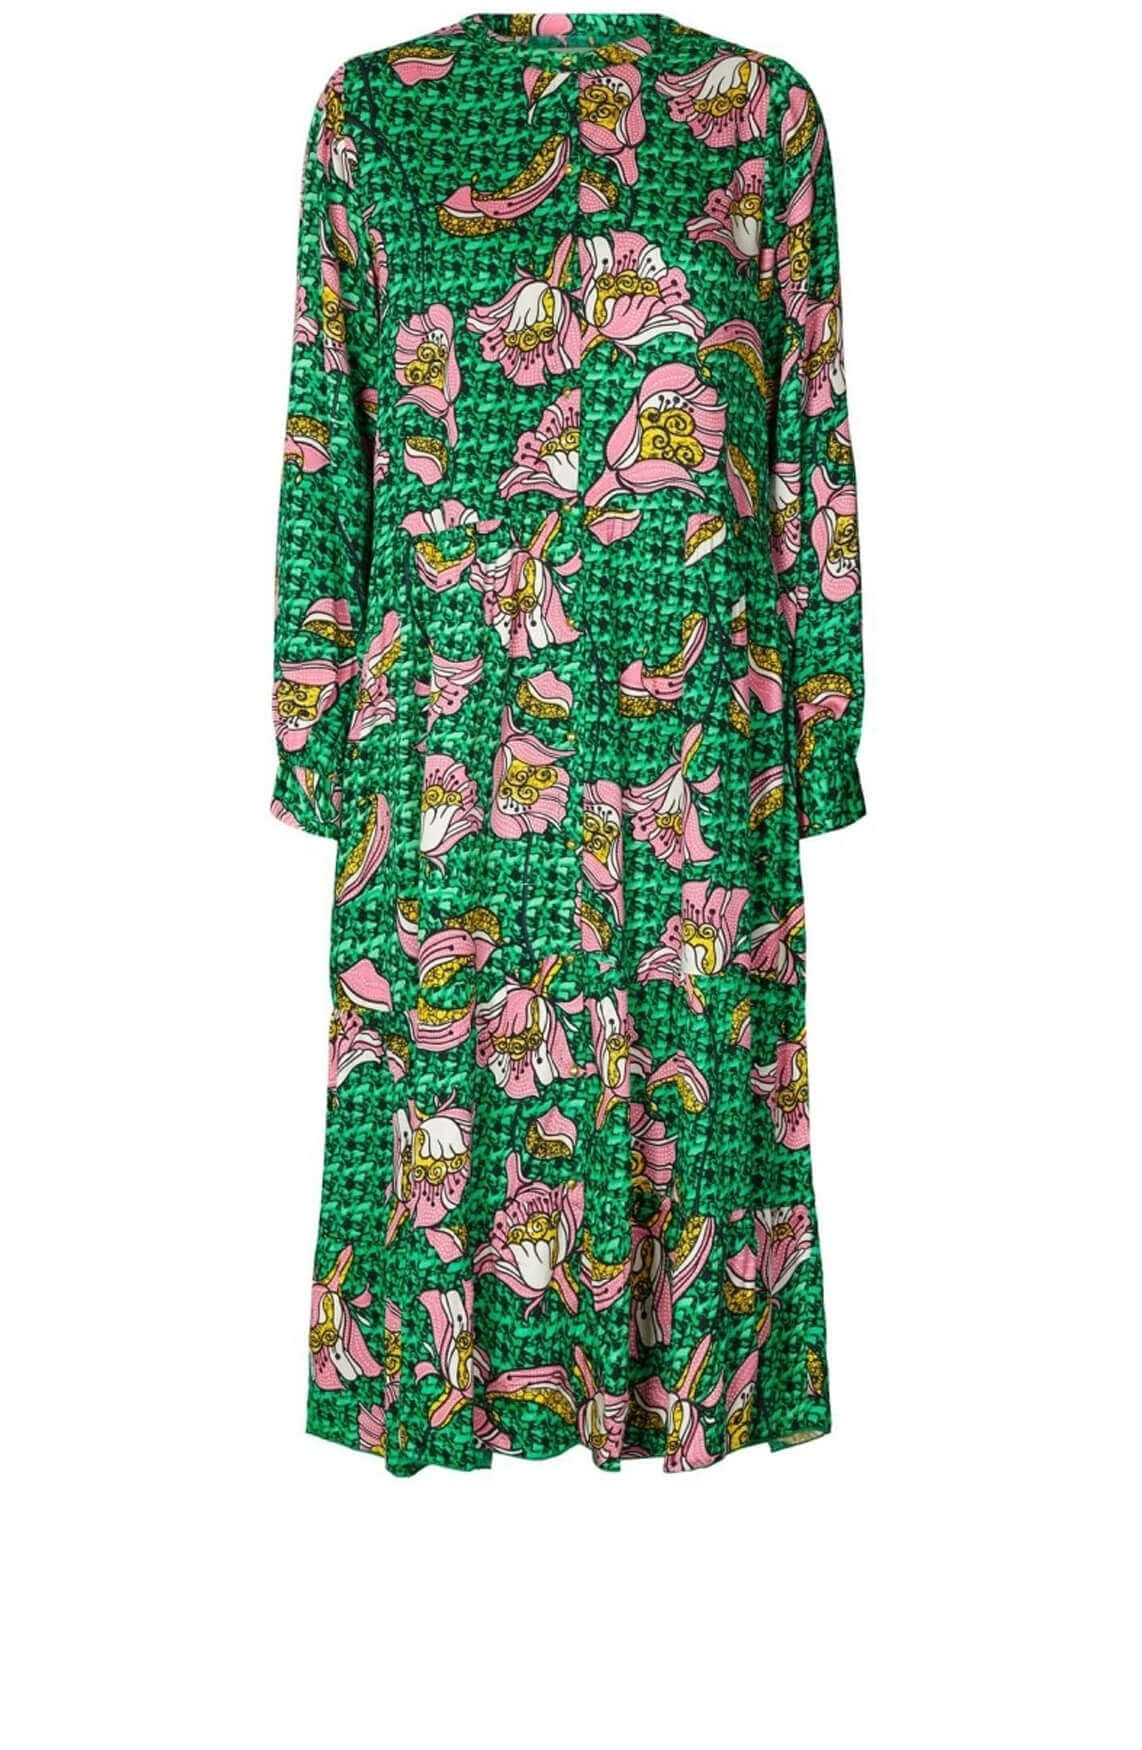 Lollys Laundry Dames Kaia jurk groen